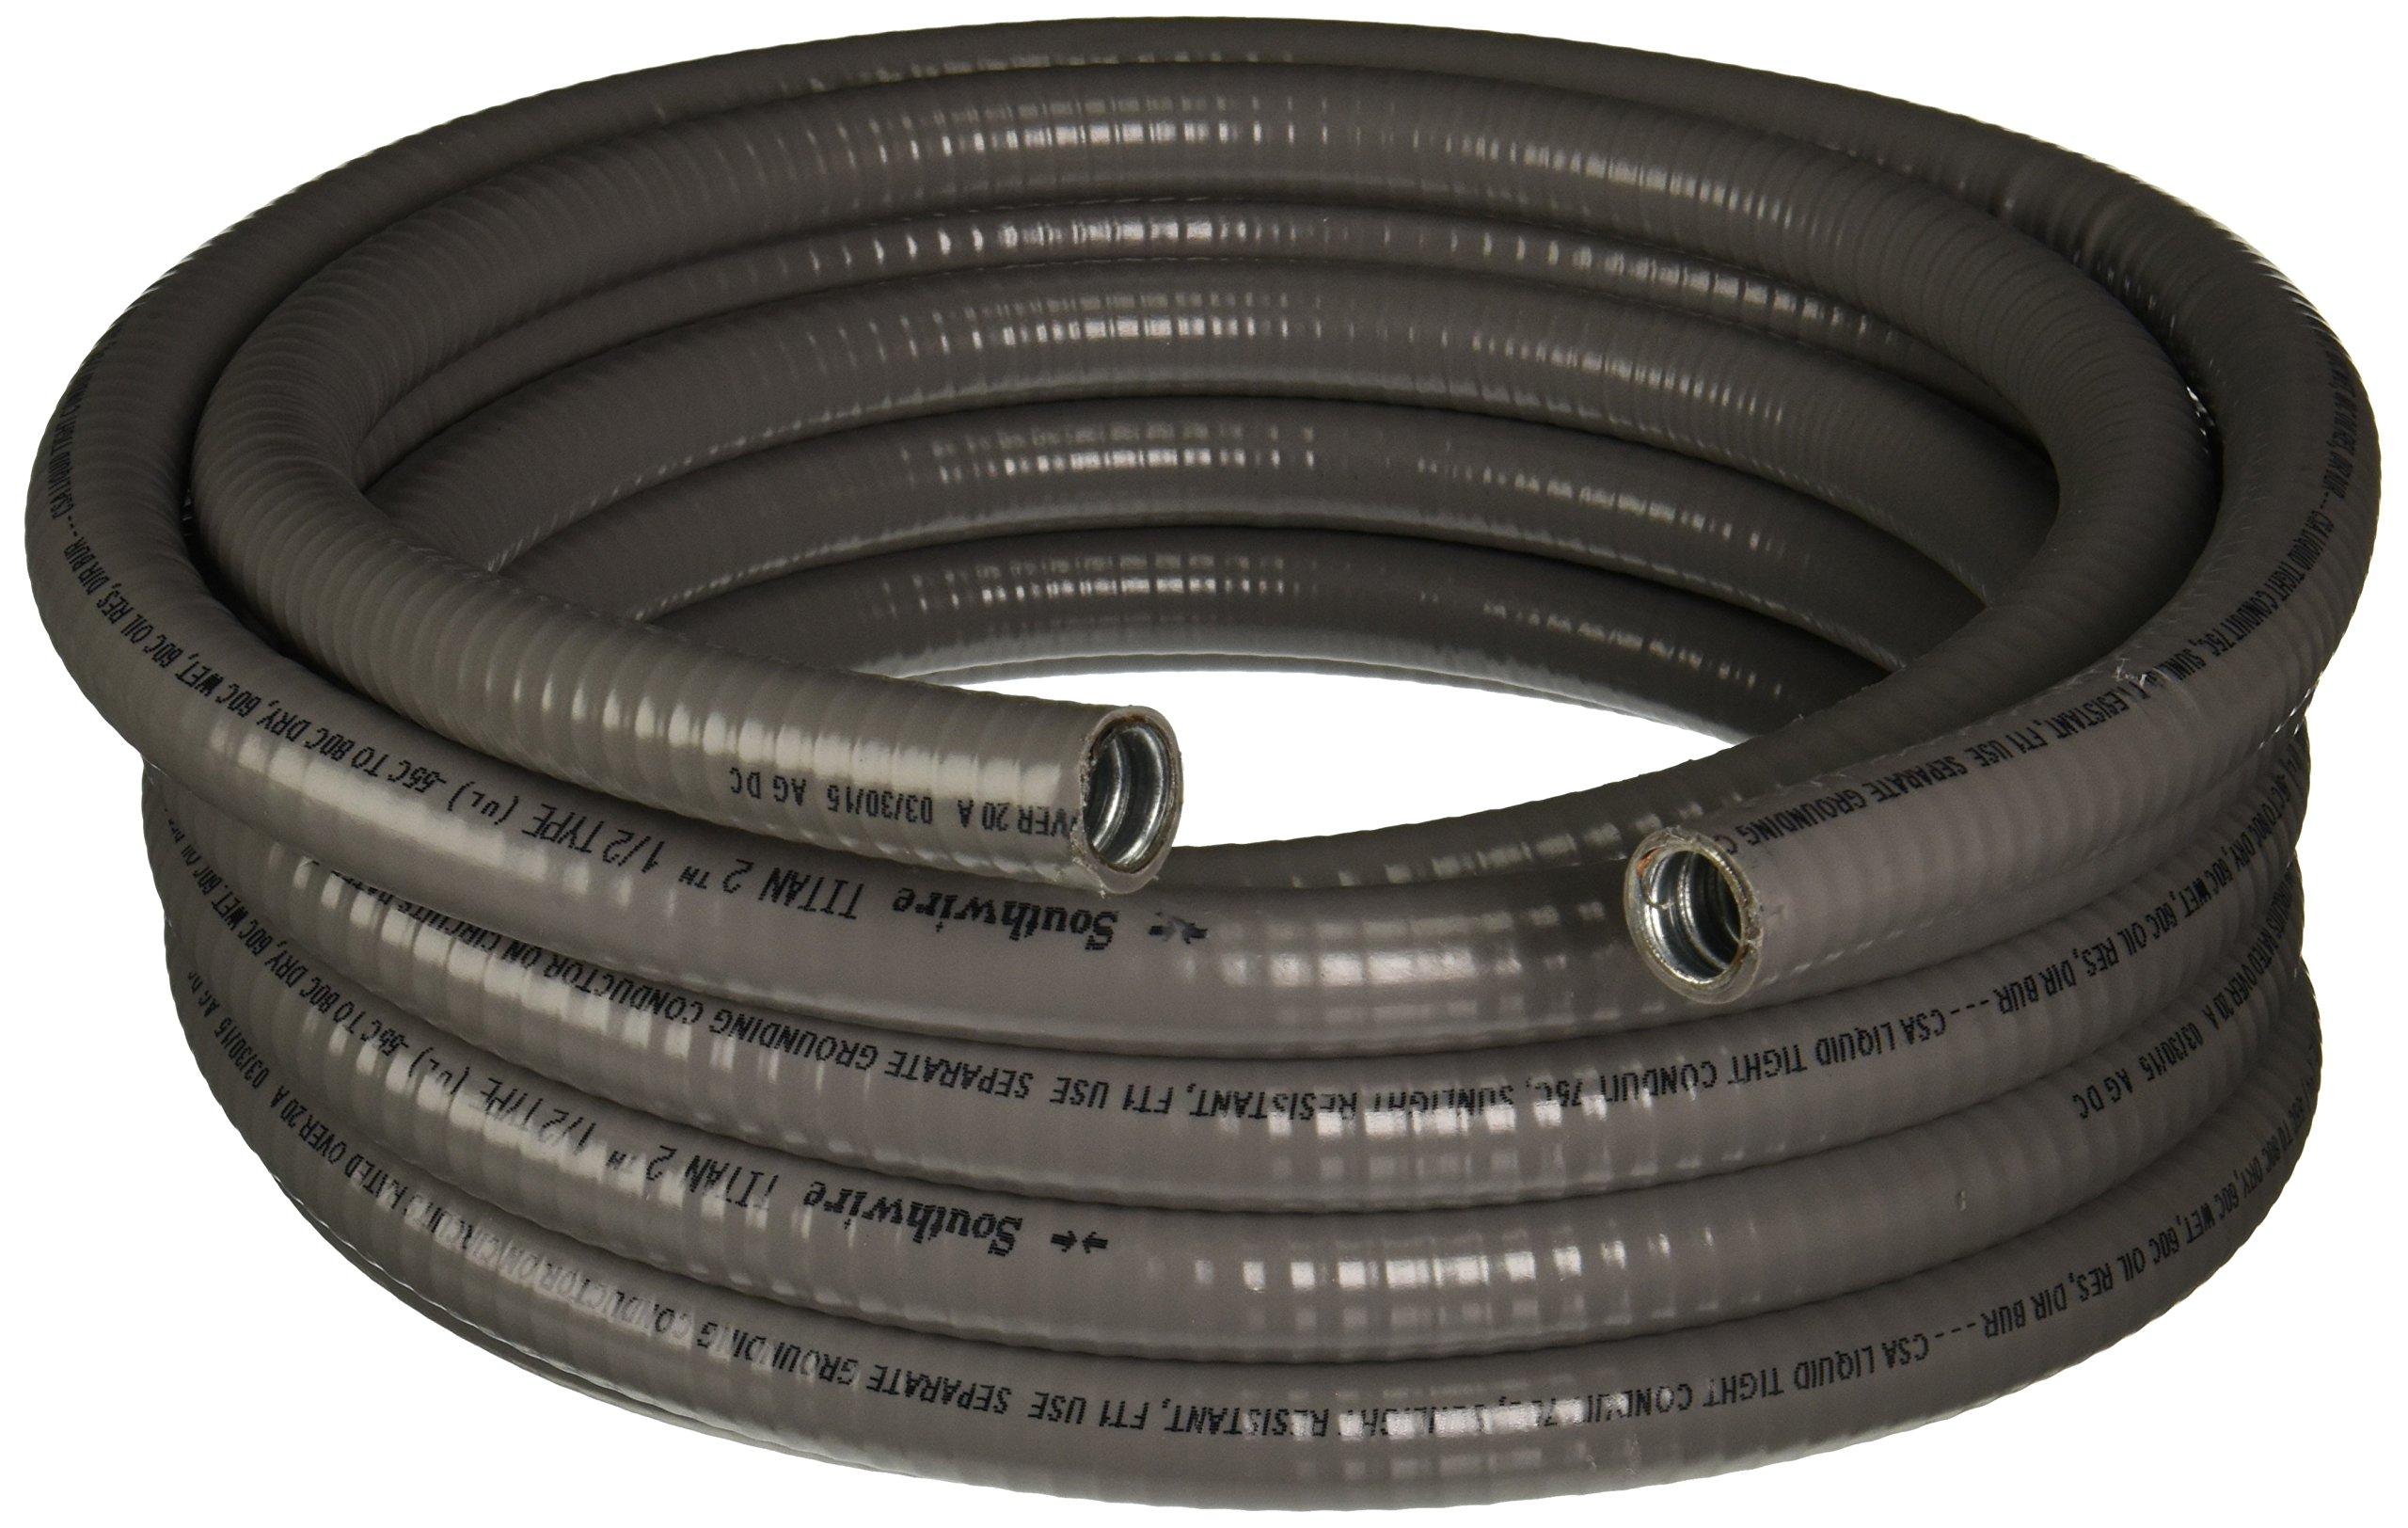 Southwire 55082621 Liqua Flex 1/2-Inch-by-25-Foot Flexible Liquidtight Metallic Conduit